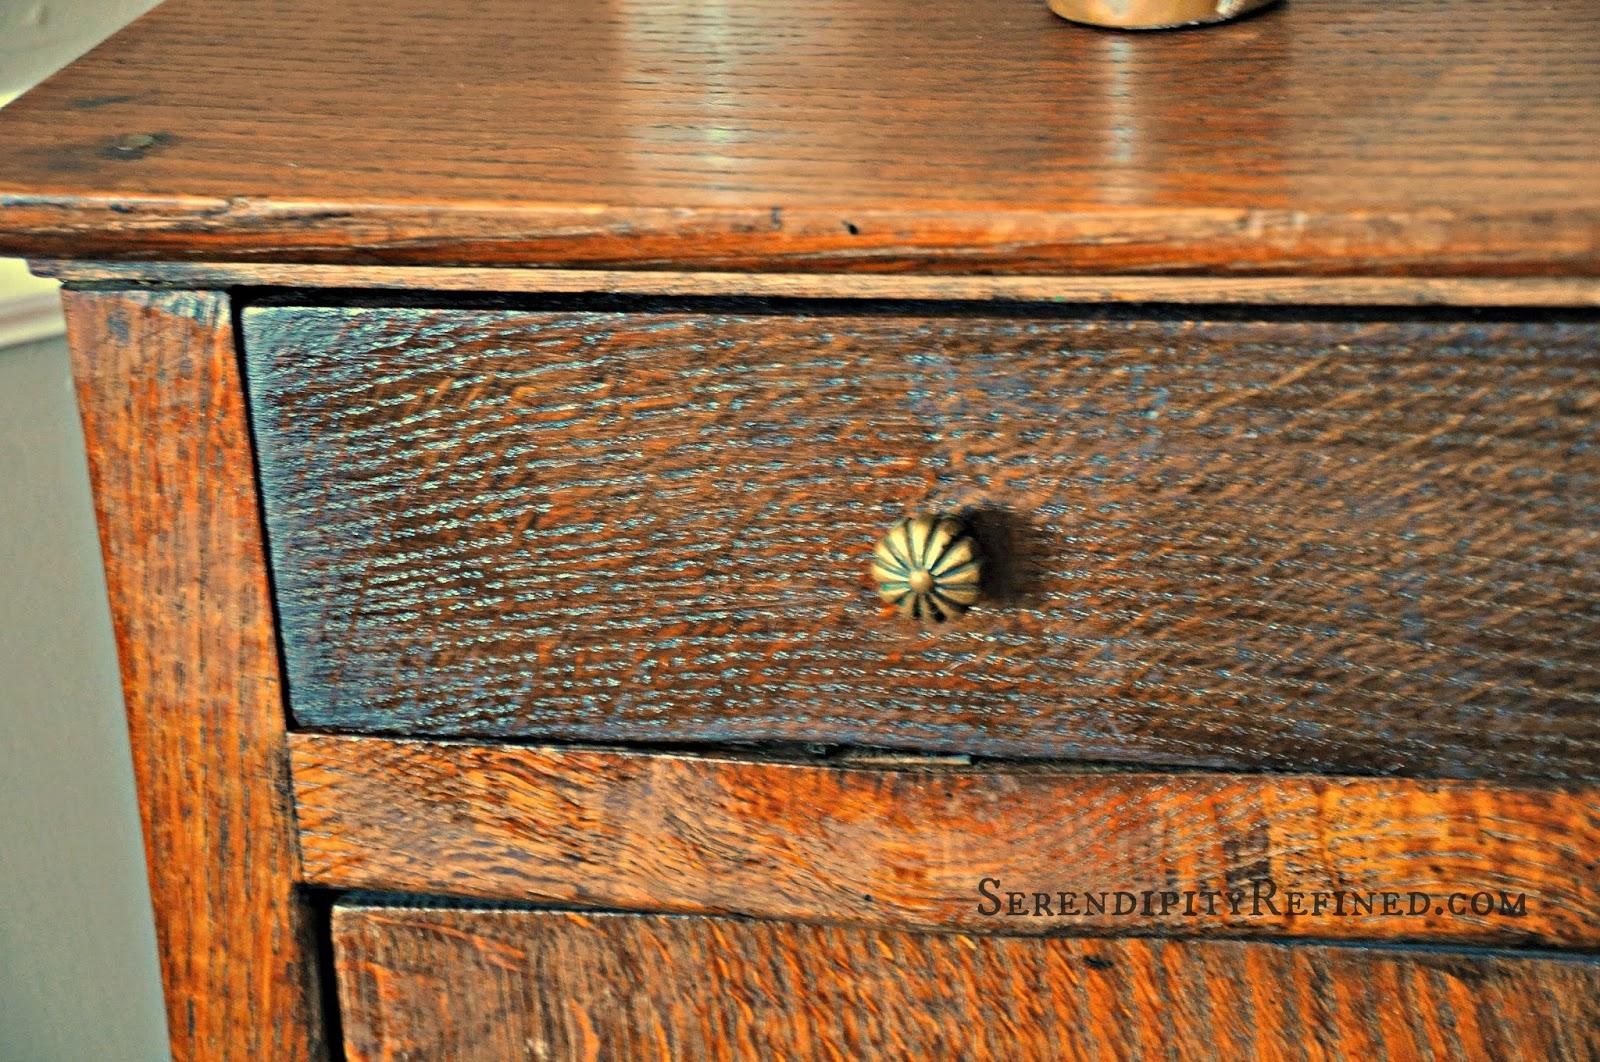 Serendipity Refined Blog: Miss Mustard Seed Hemp Oil on Unpainted ...